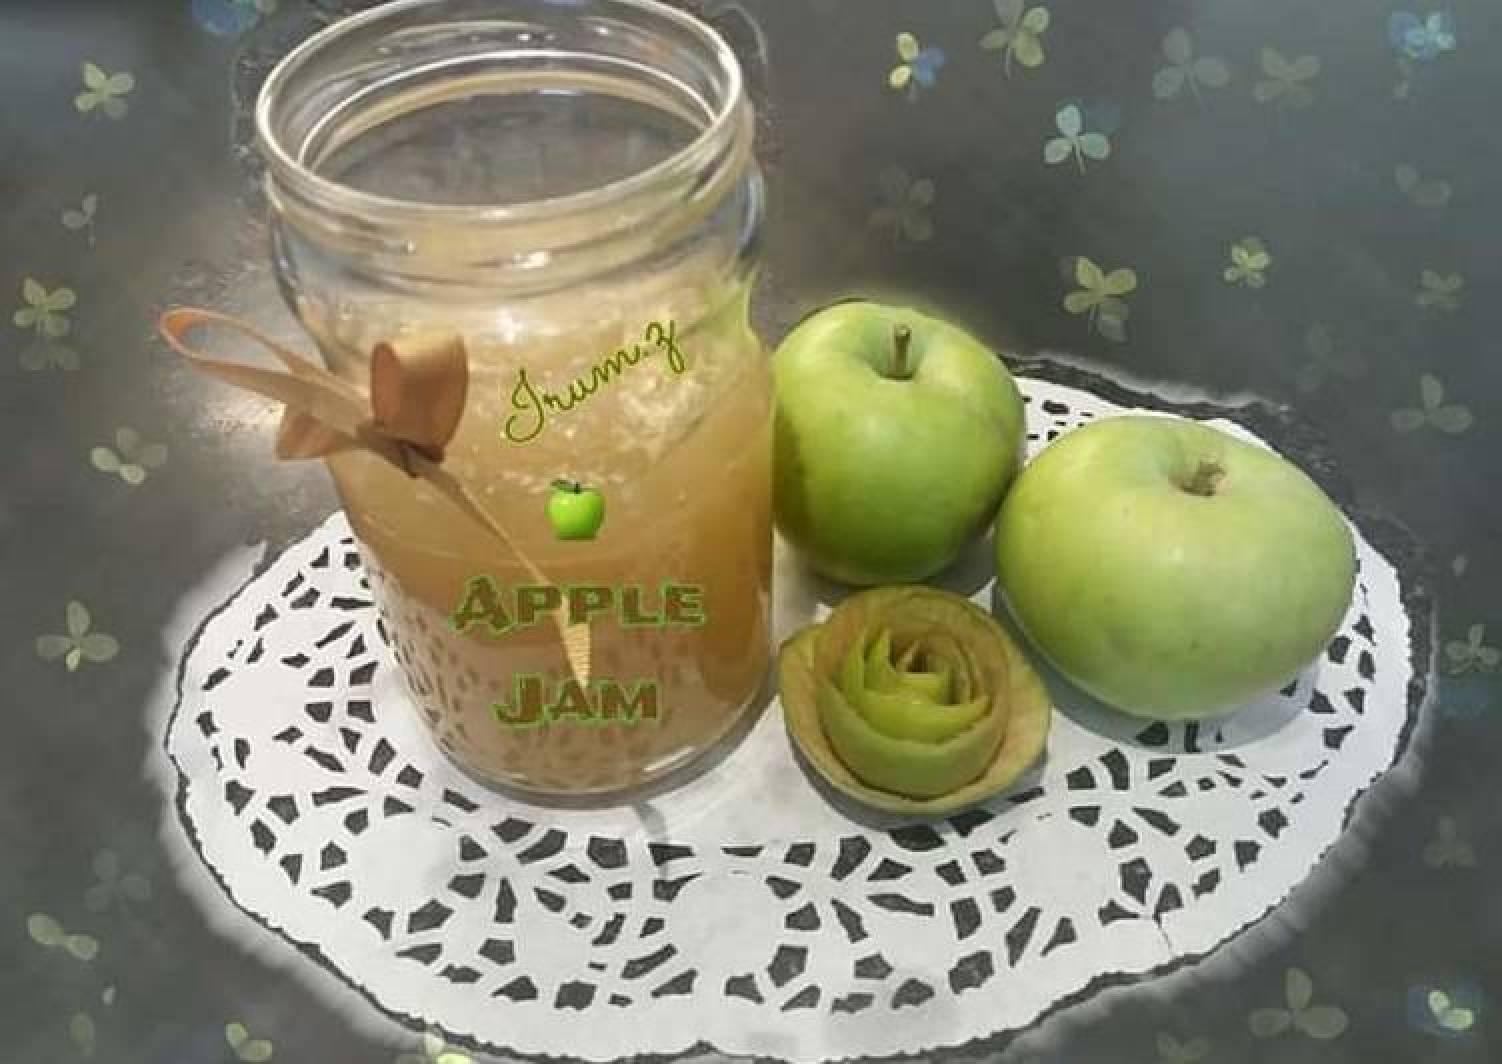 🍏🍎Homemade Apple Jam🍏🍎 (made from homegrown apples)